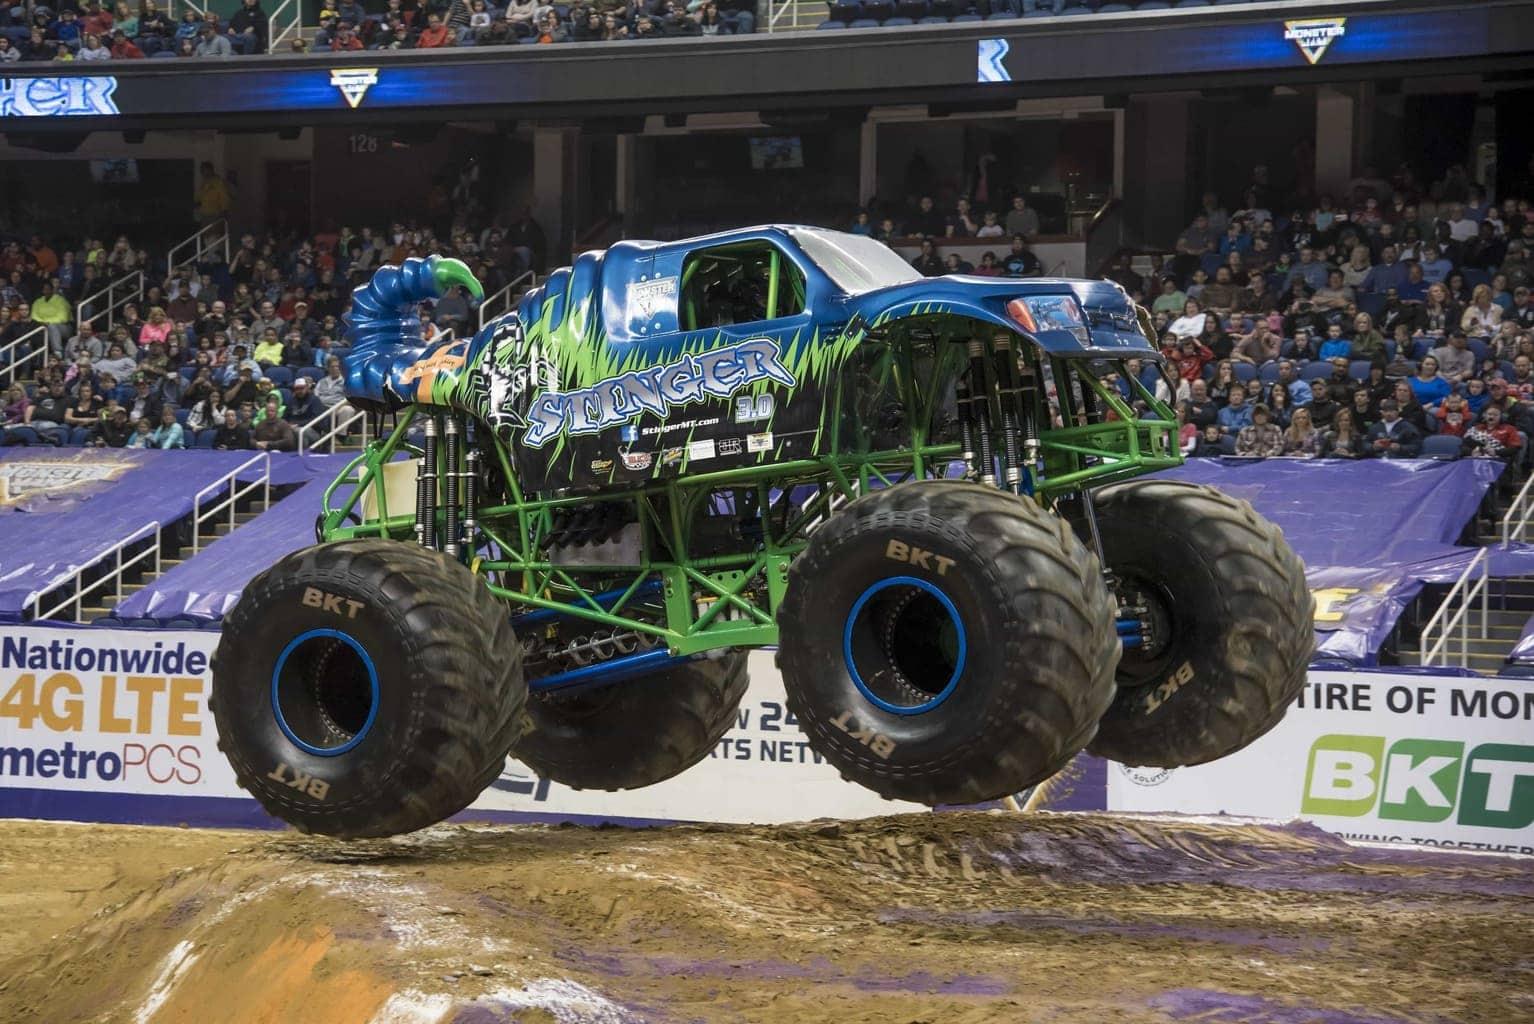 Monster Jam Races Into Mercedes-Benz Stadium